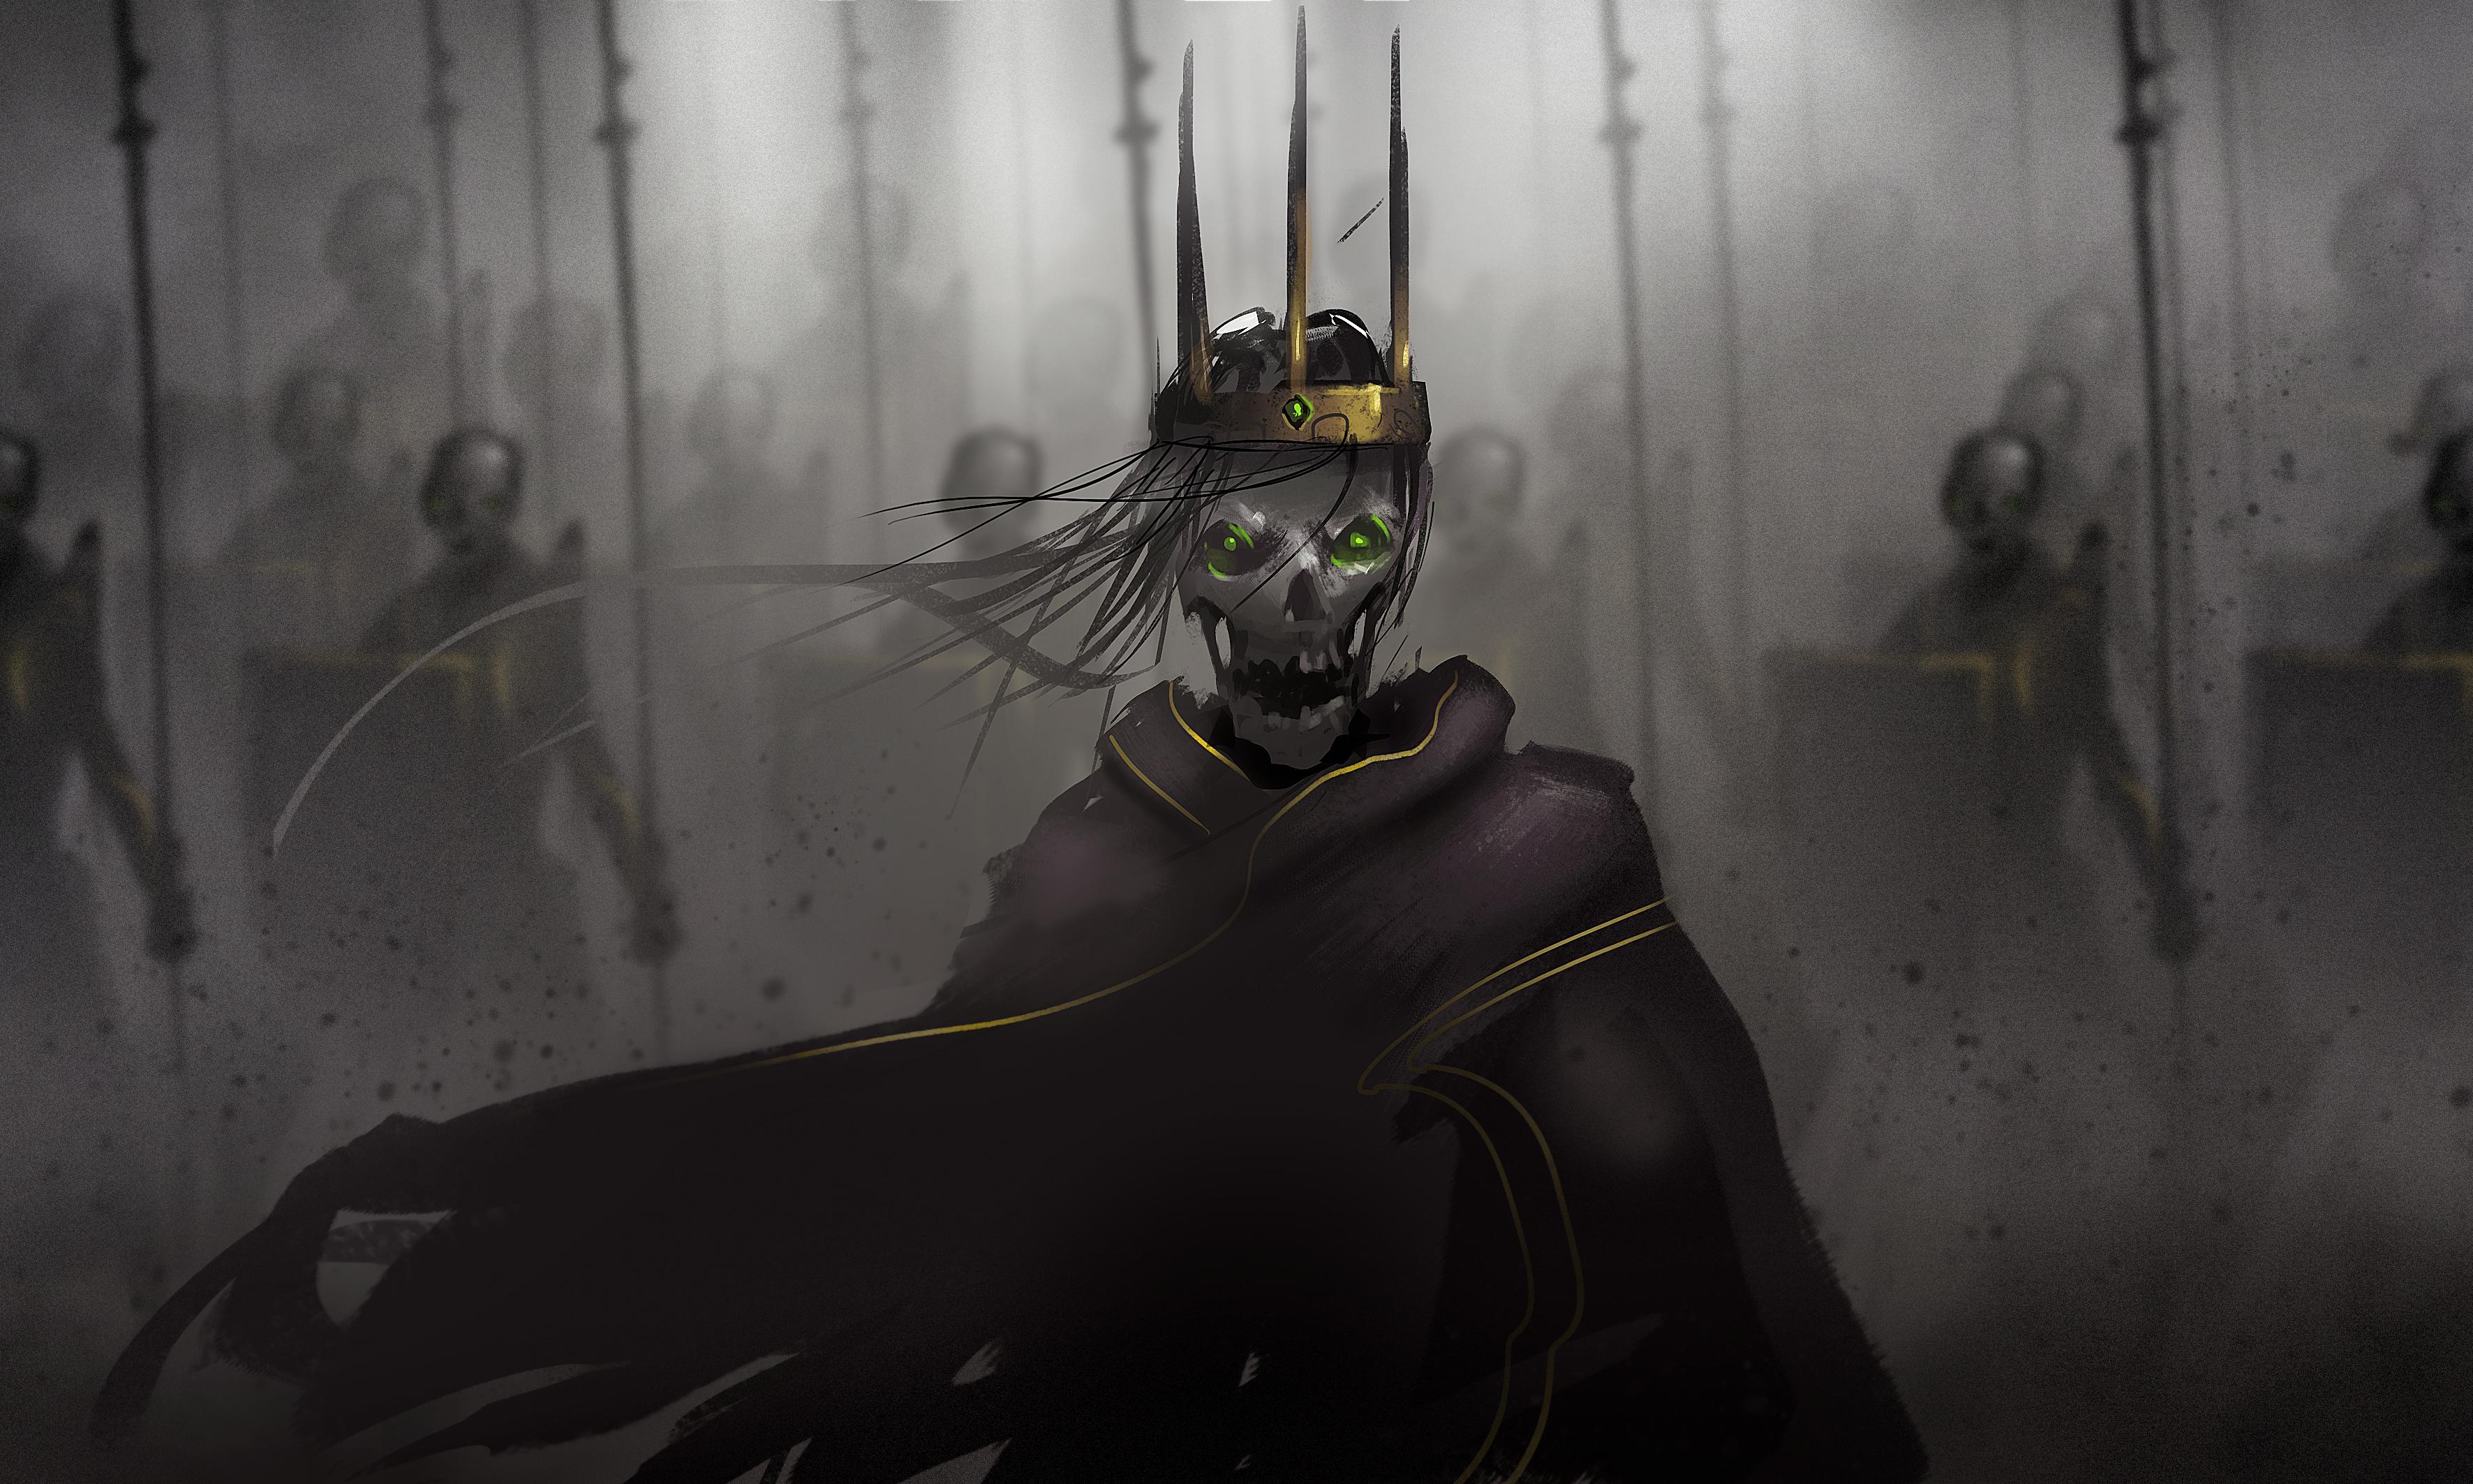 Skeleton lord hd wallpaper background image 3543x2126 id 681022 wallpaper abyss - Hd wallpapers of darkness ...